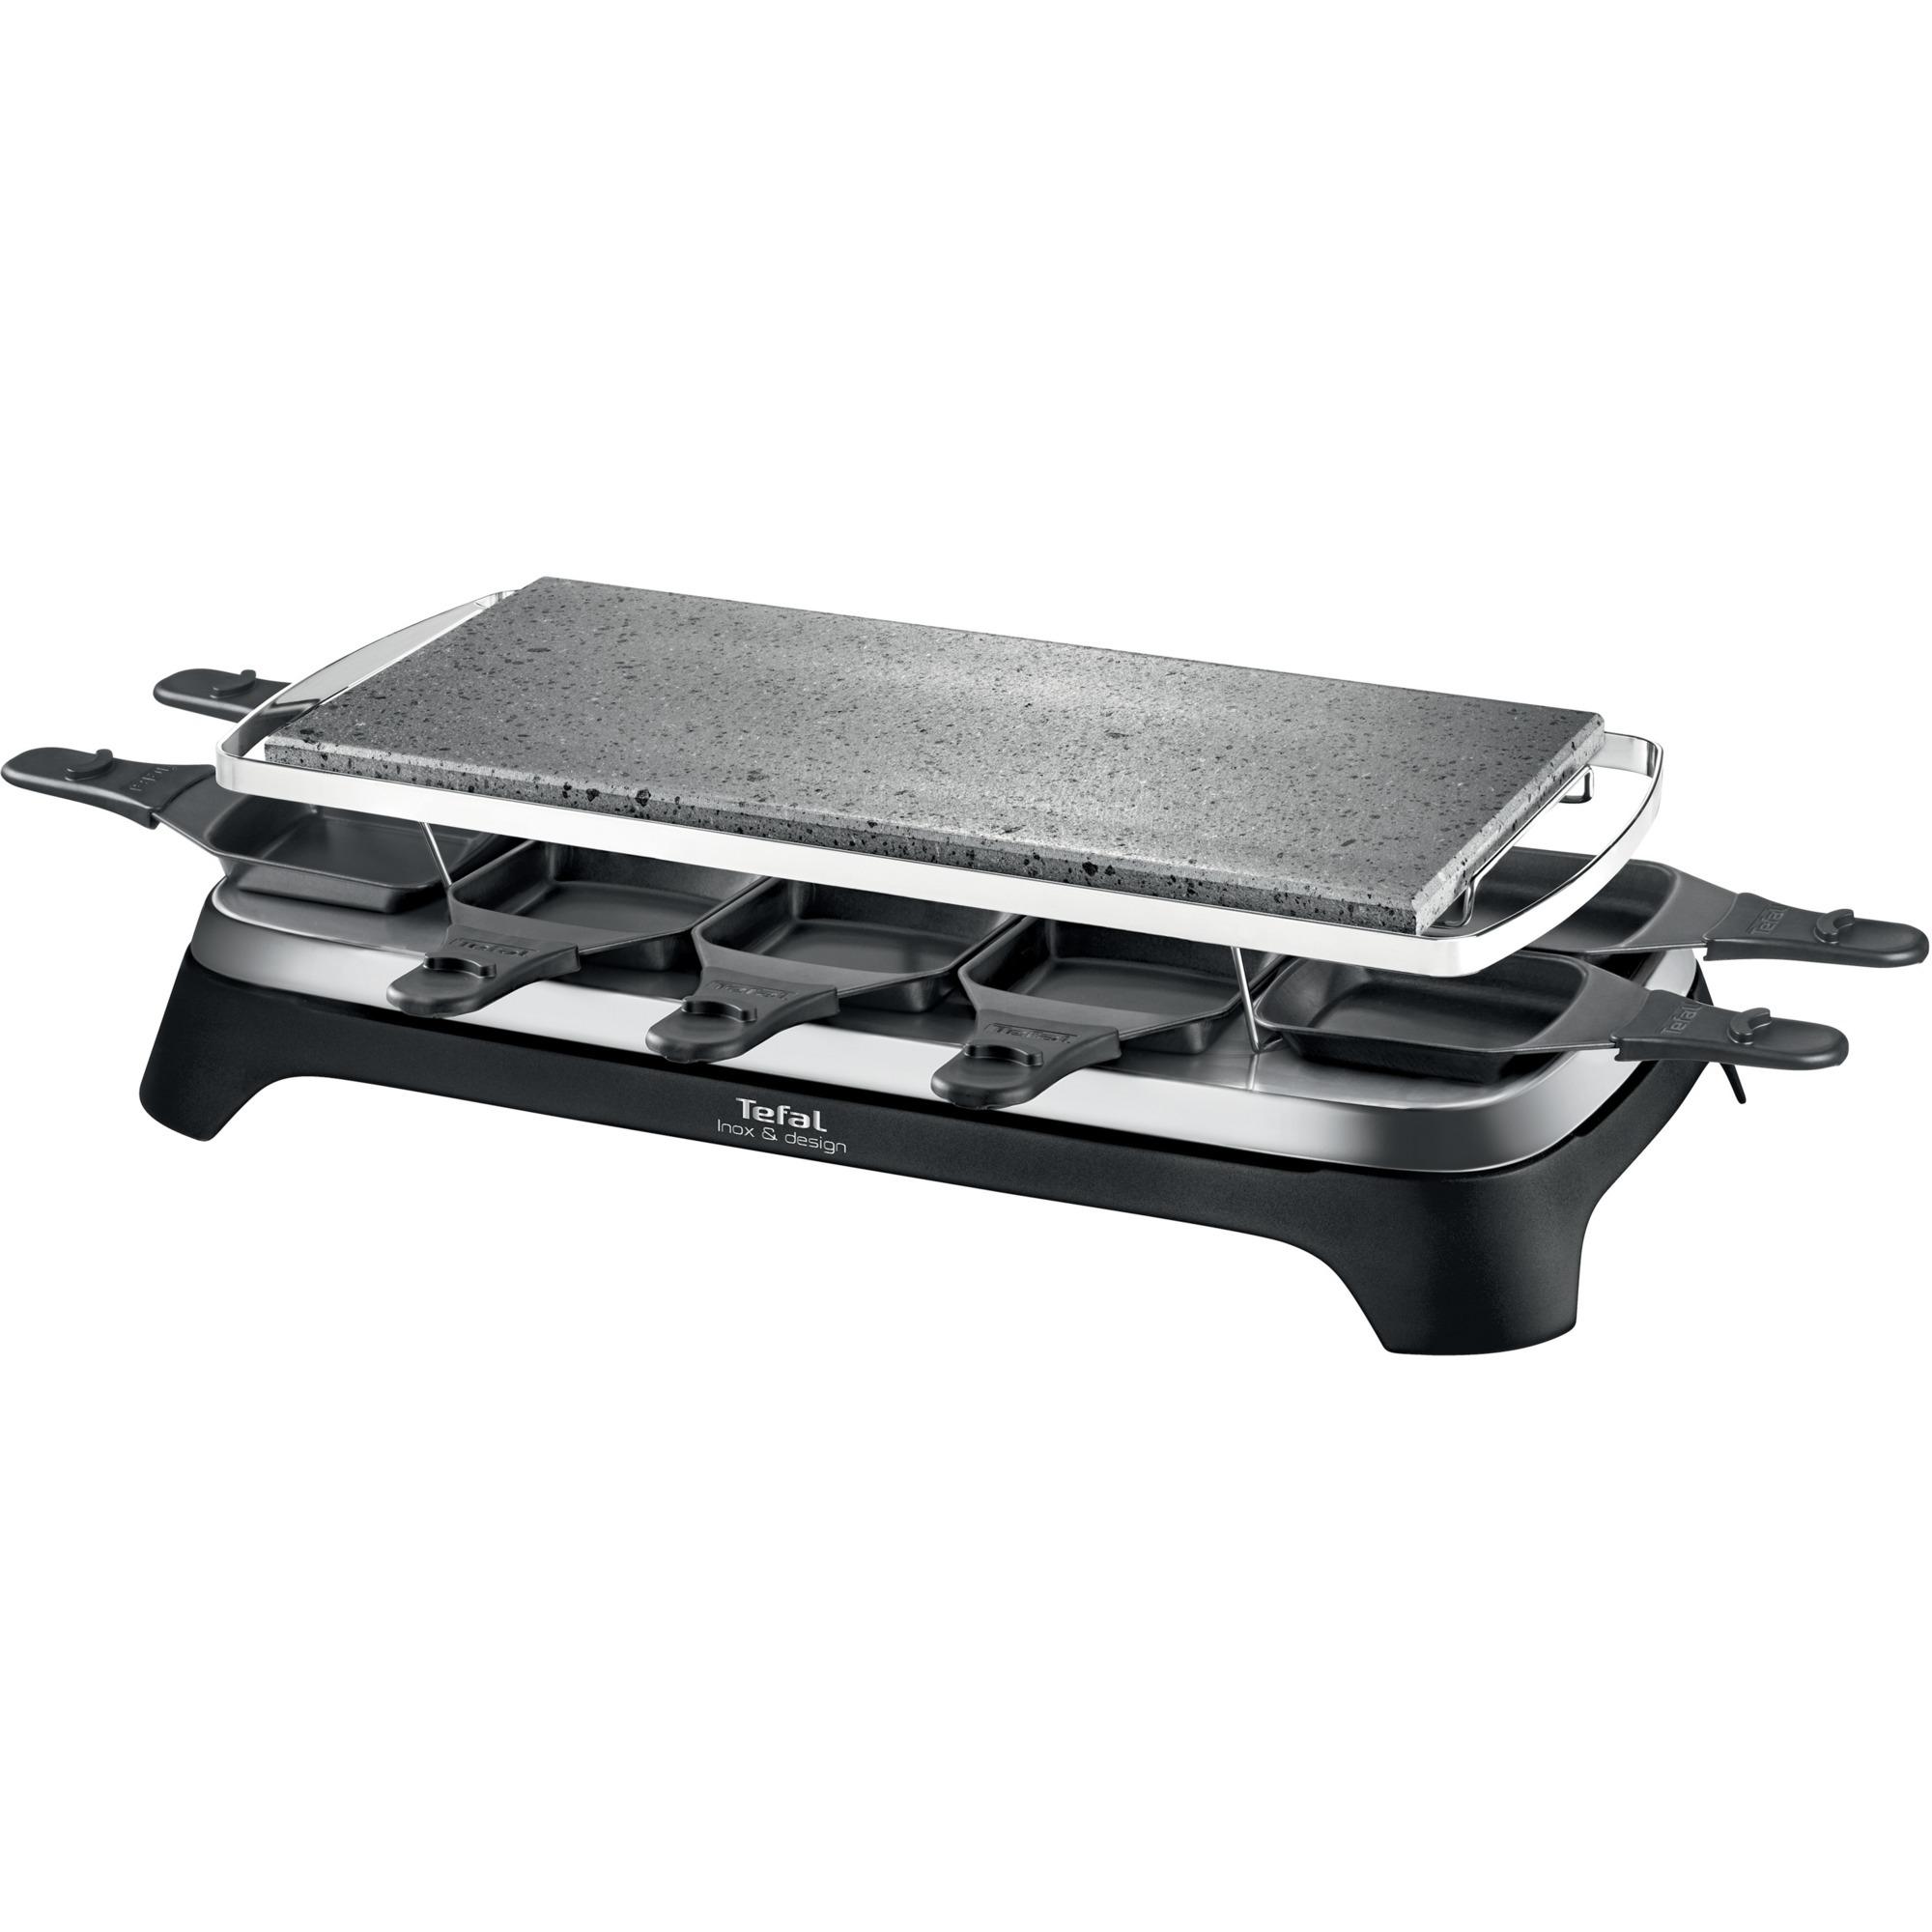 Steengrill 10 Inox&Design 10personas(s) 1350W Negro, Acero inoxidable raclett eléctrico, Raclette